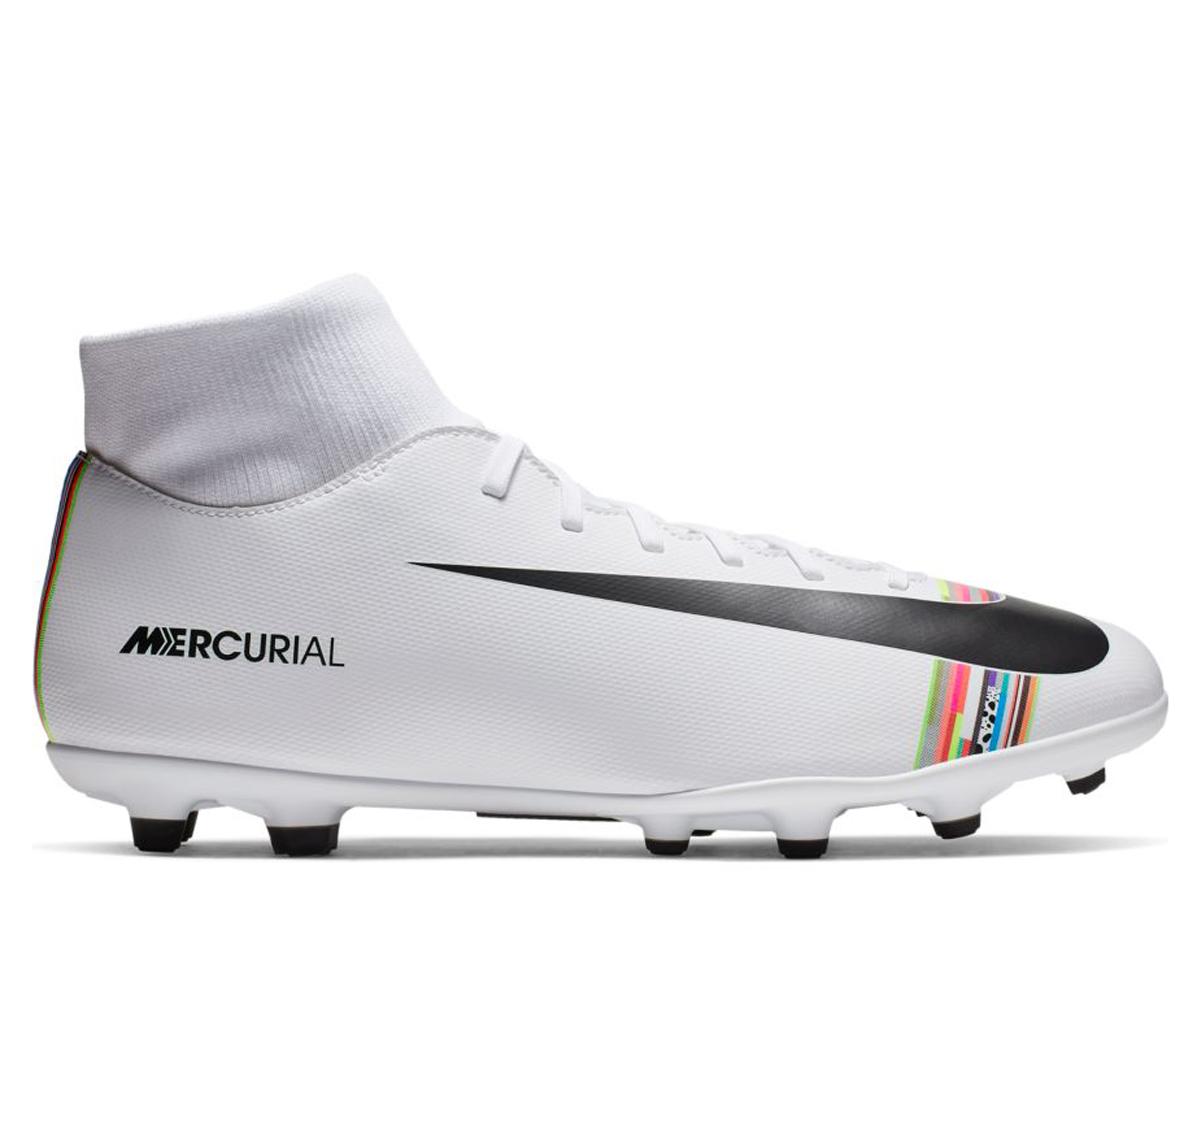 8319791c29e Παπούτσια | Ποδόσφαιρο (Ταξινόμηση: Ακριβότερα) | Σελίδα 20 | Snif.gr